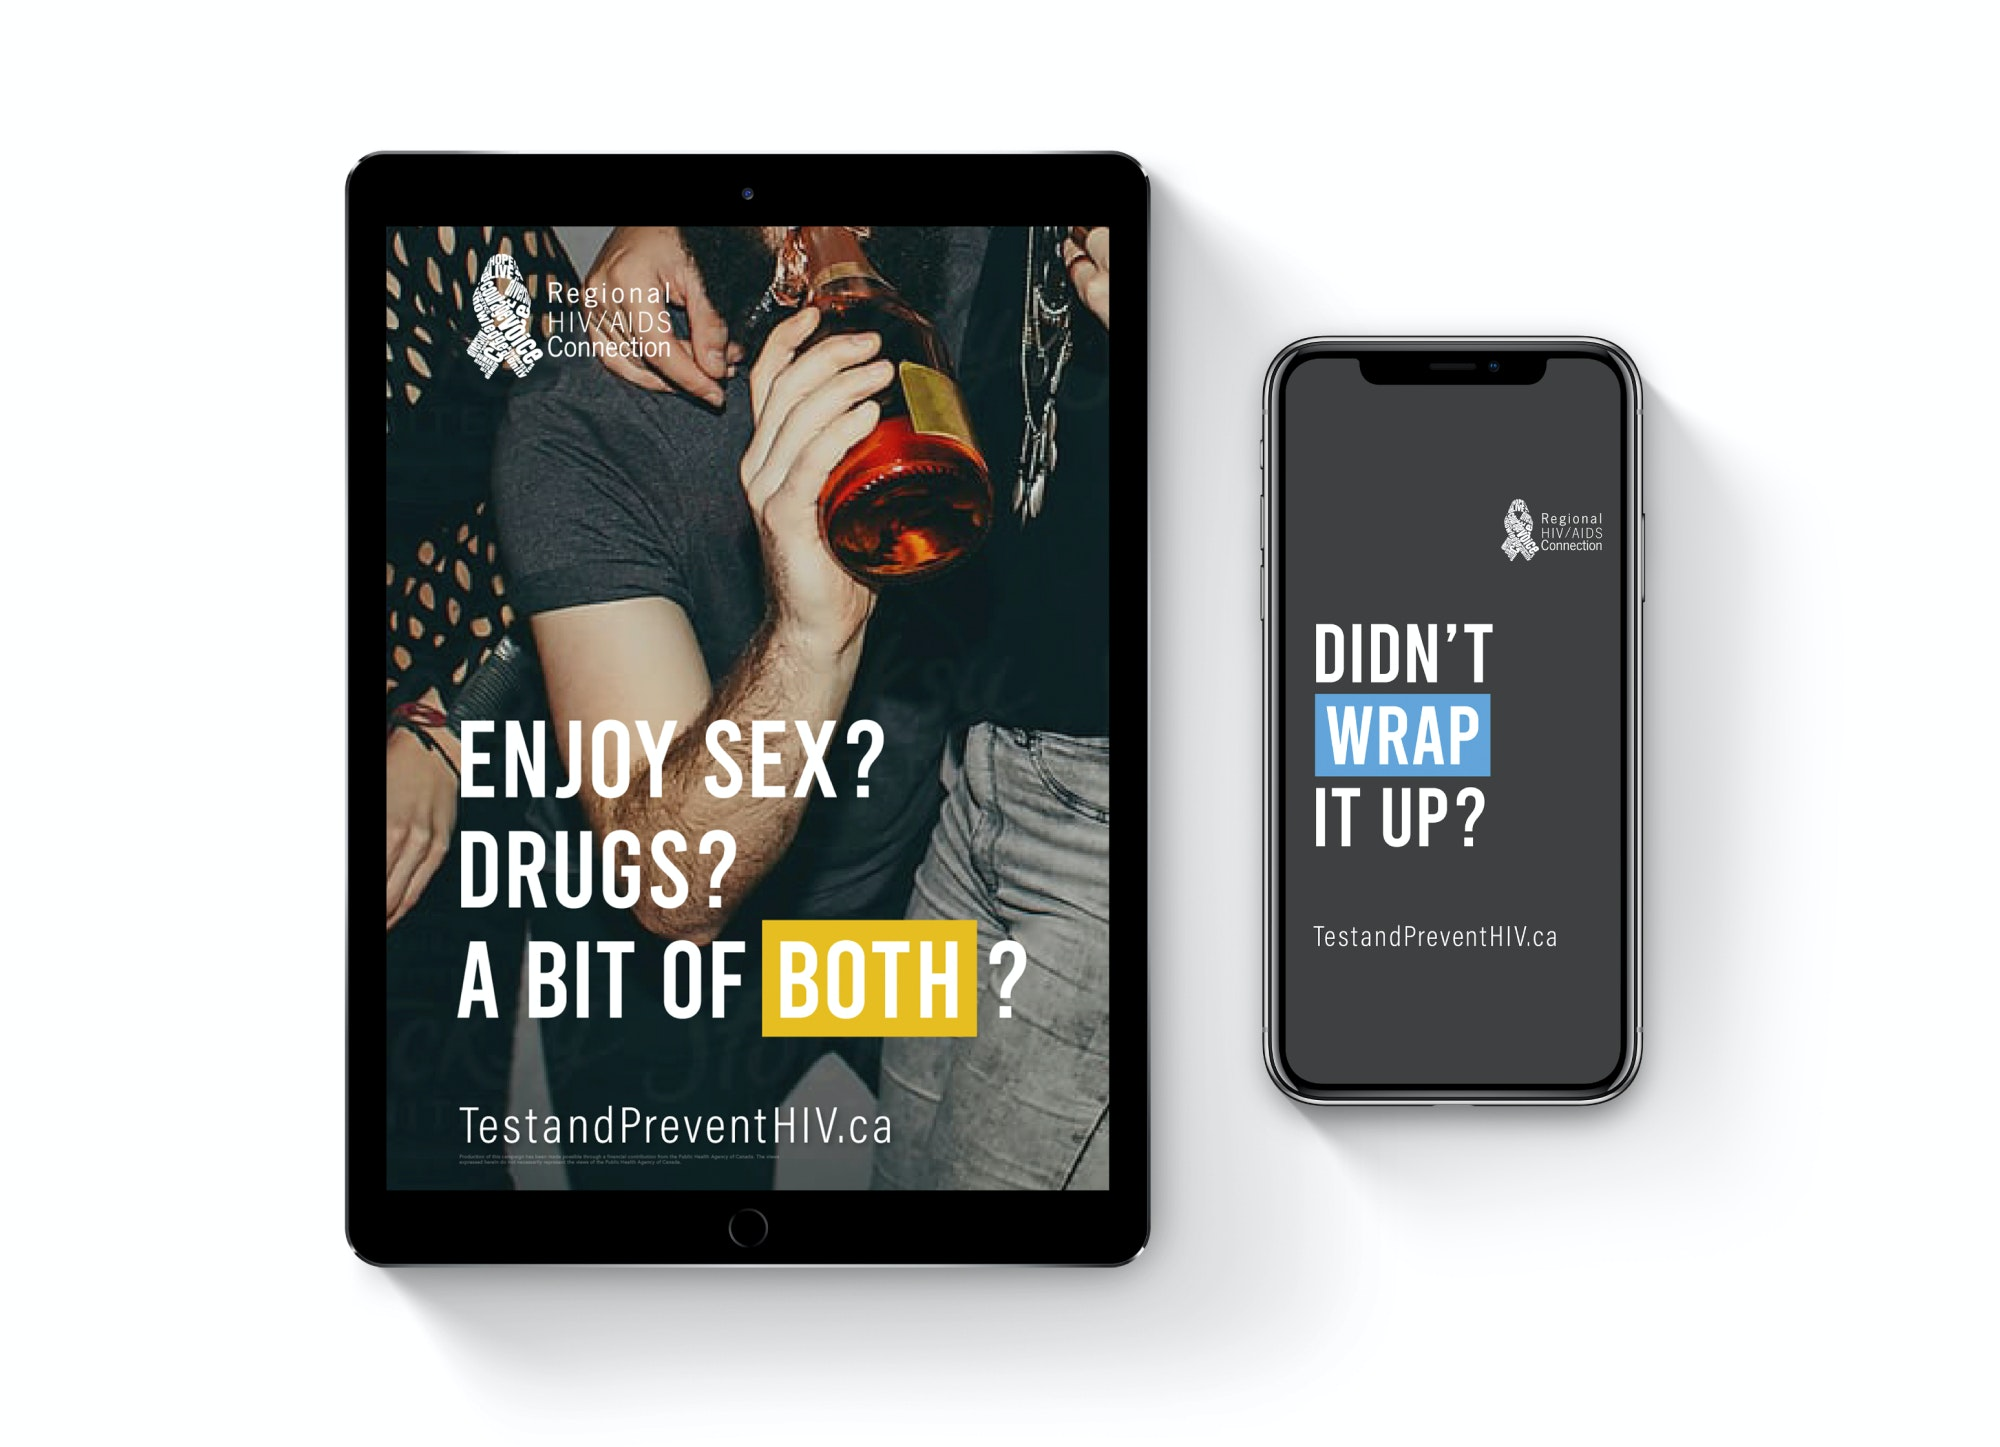 Phase three digital advertisments